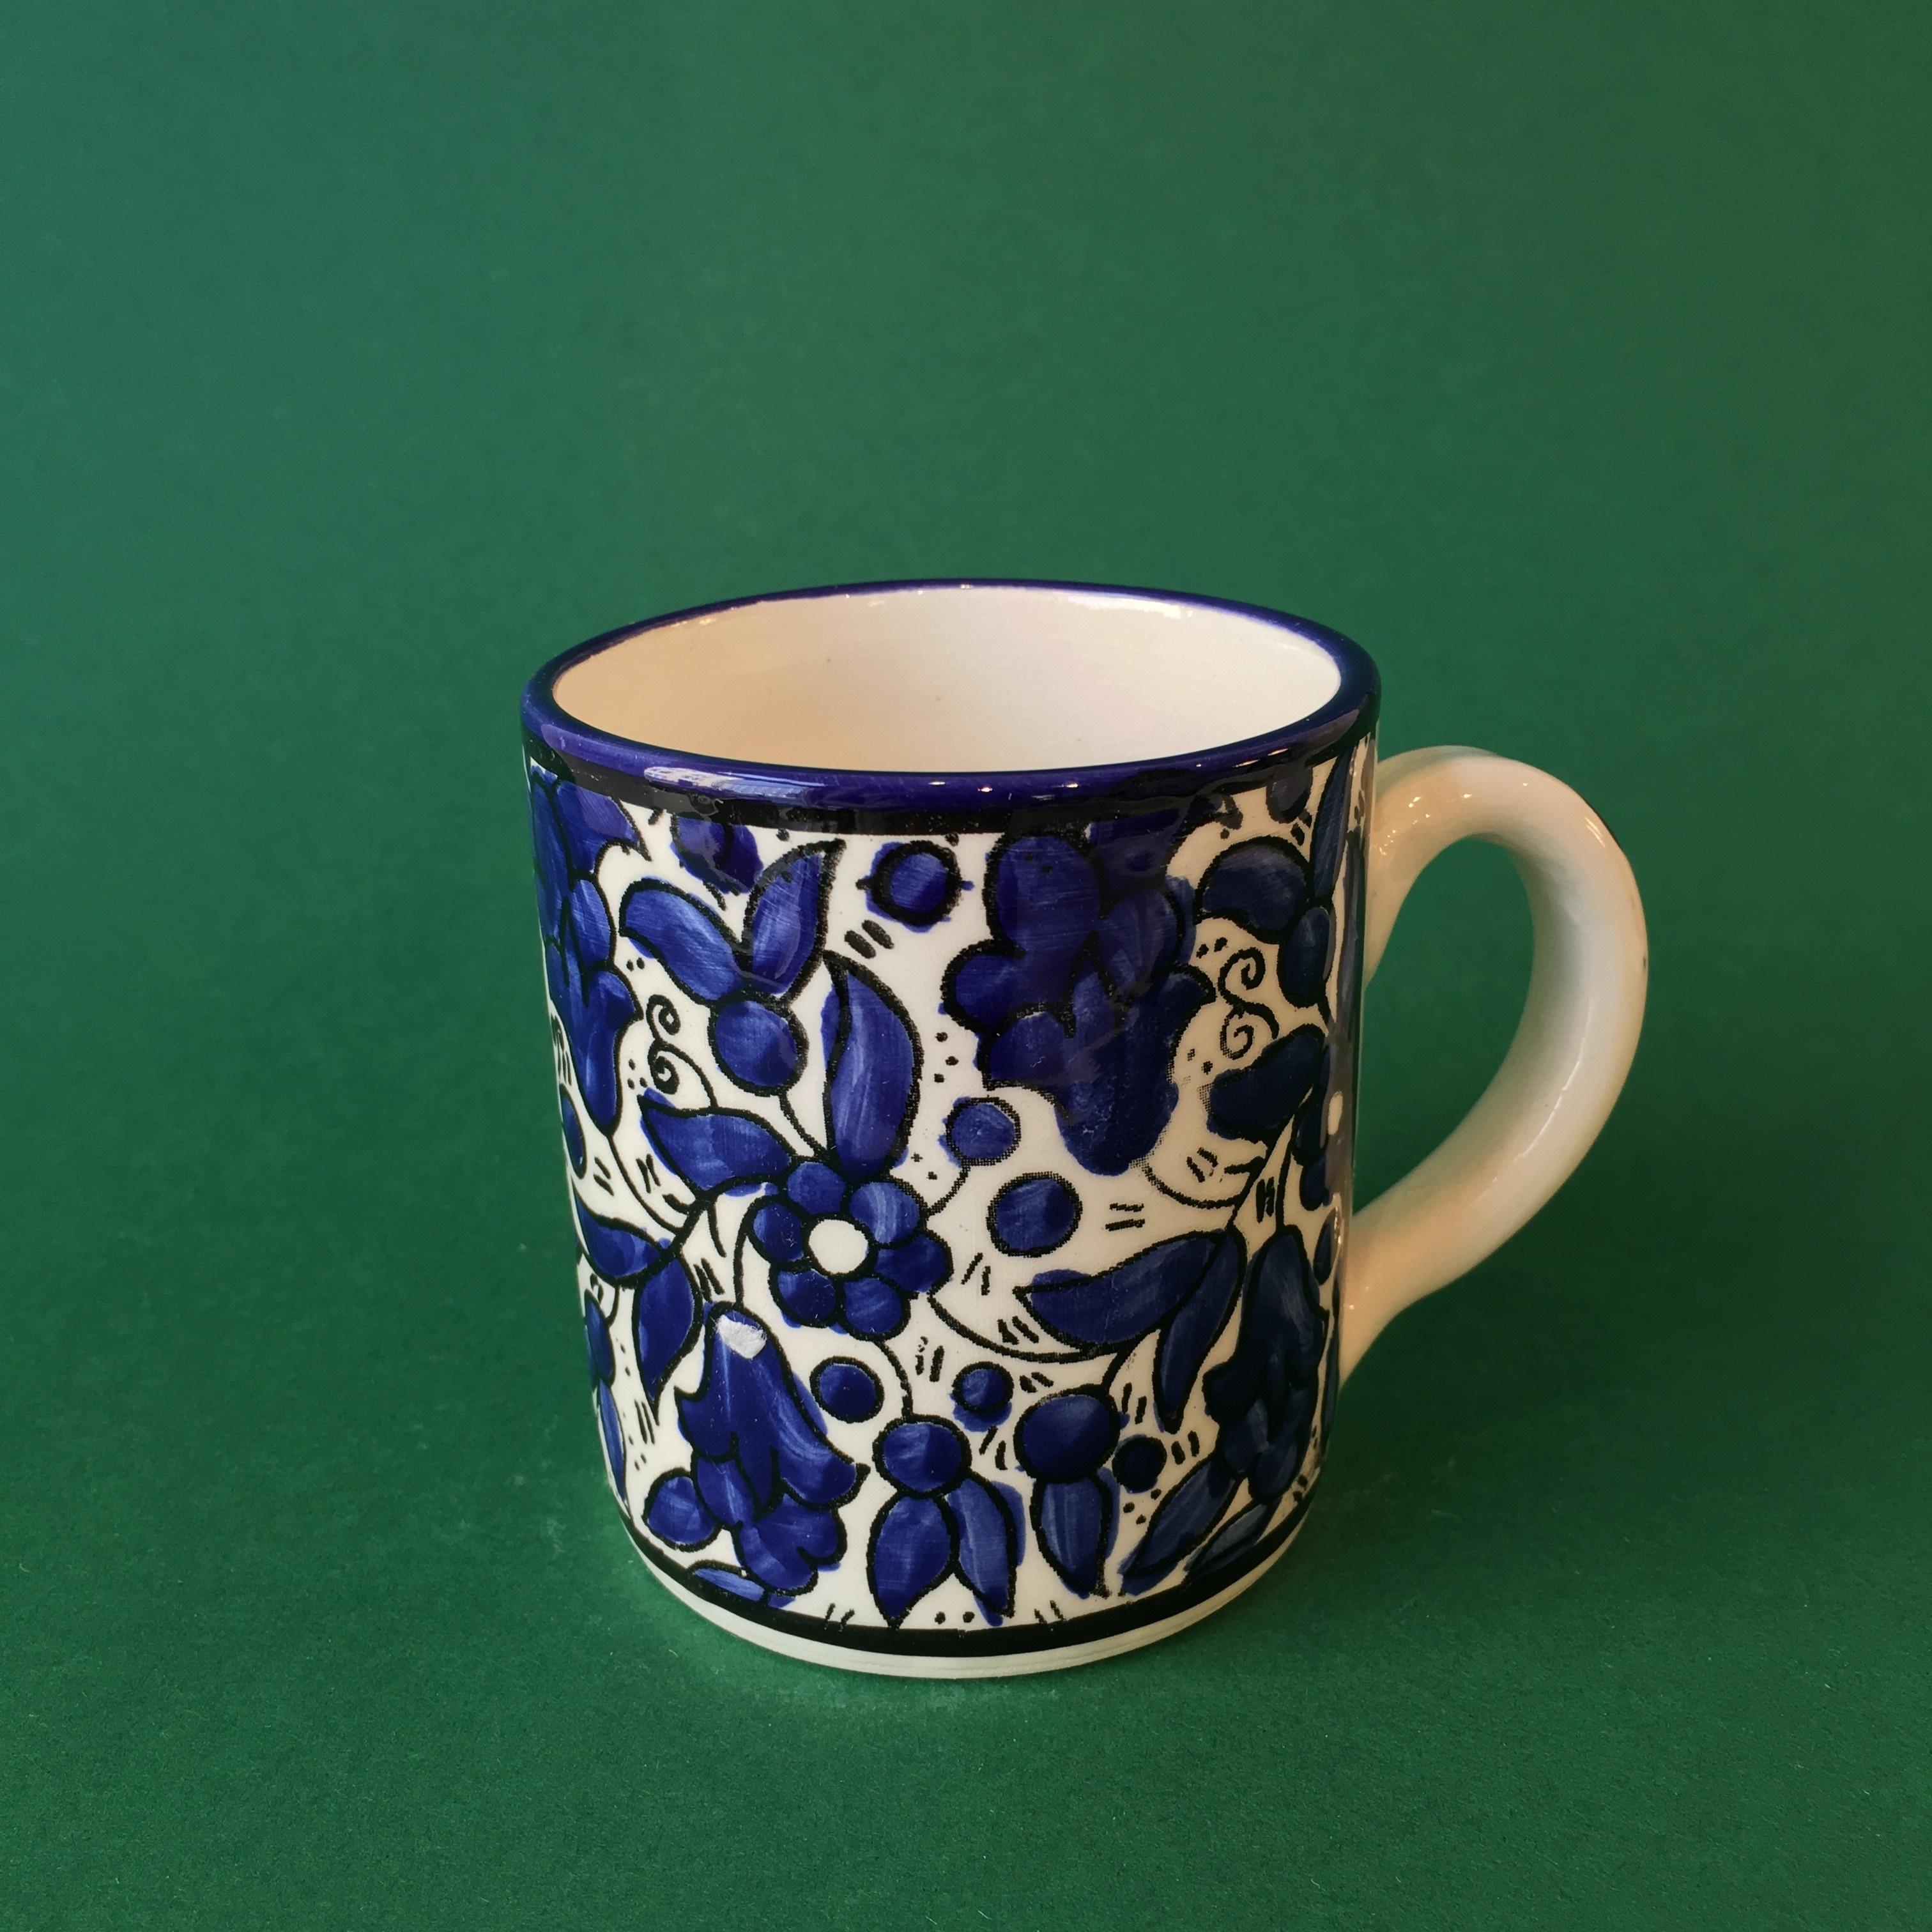 Mellomstor keramikkopp, blå